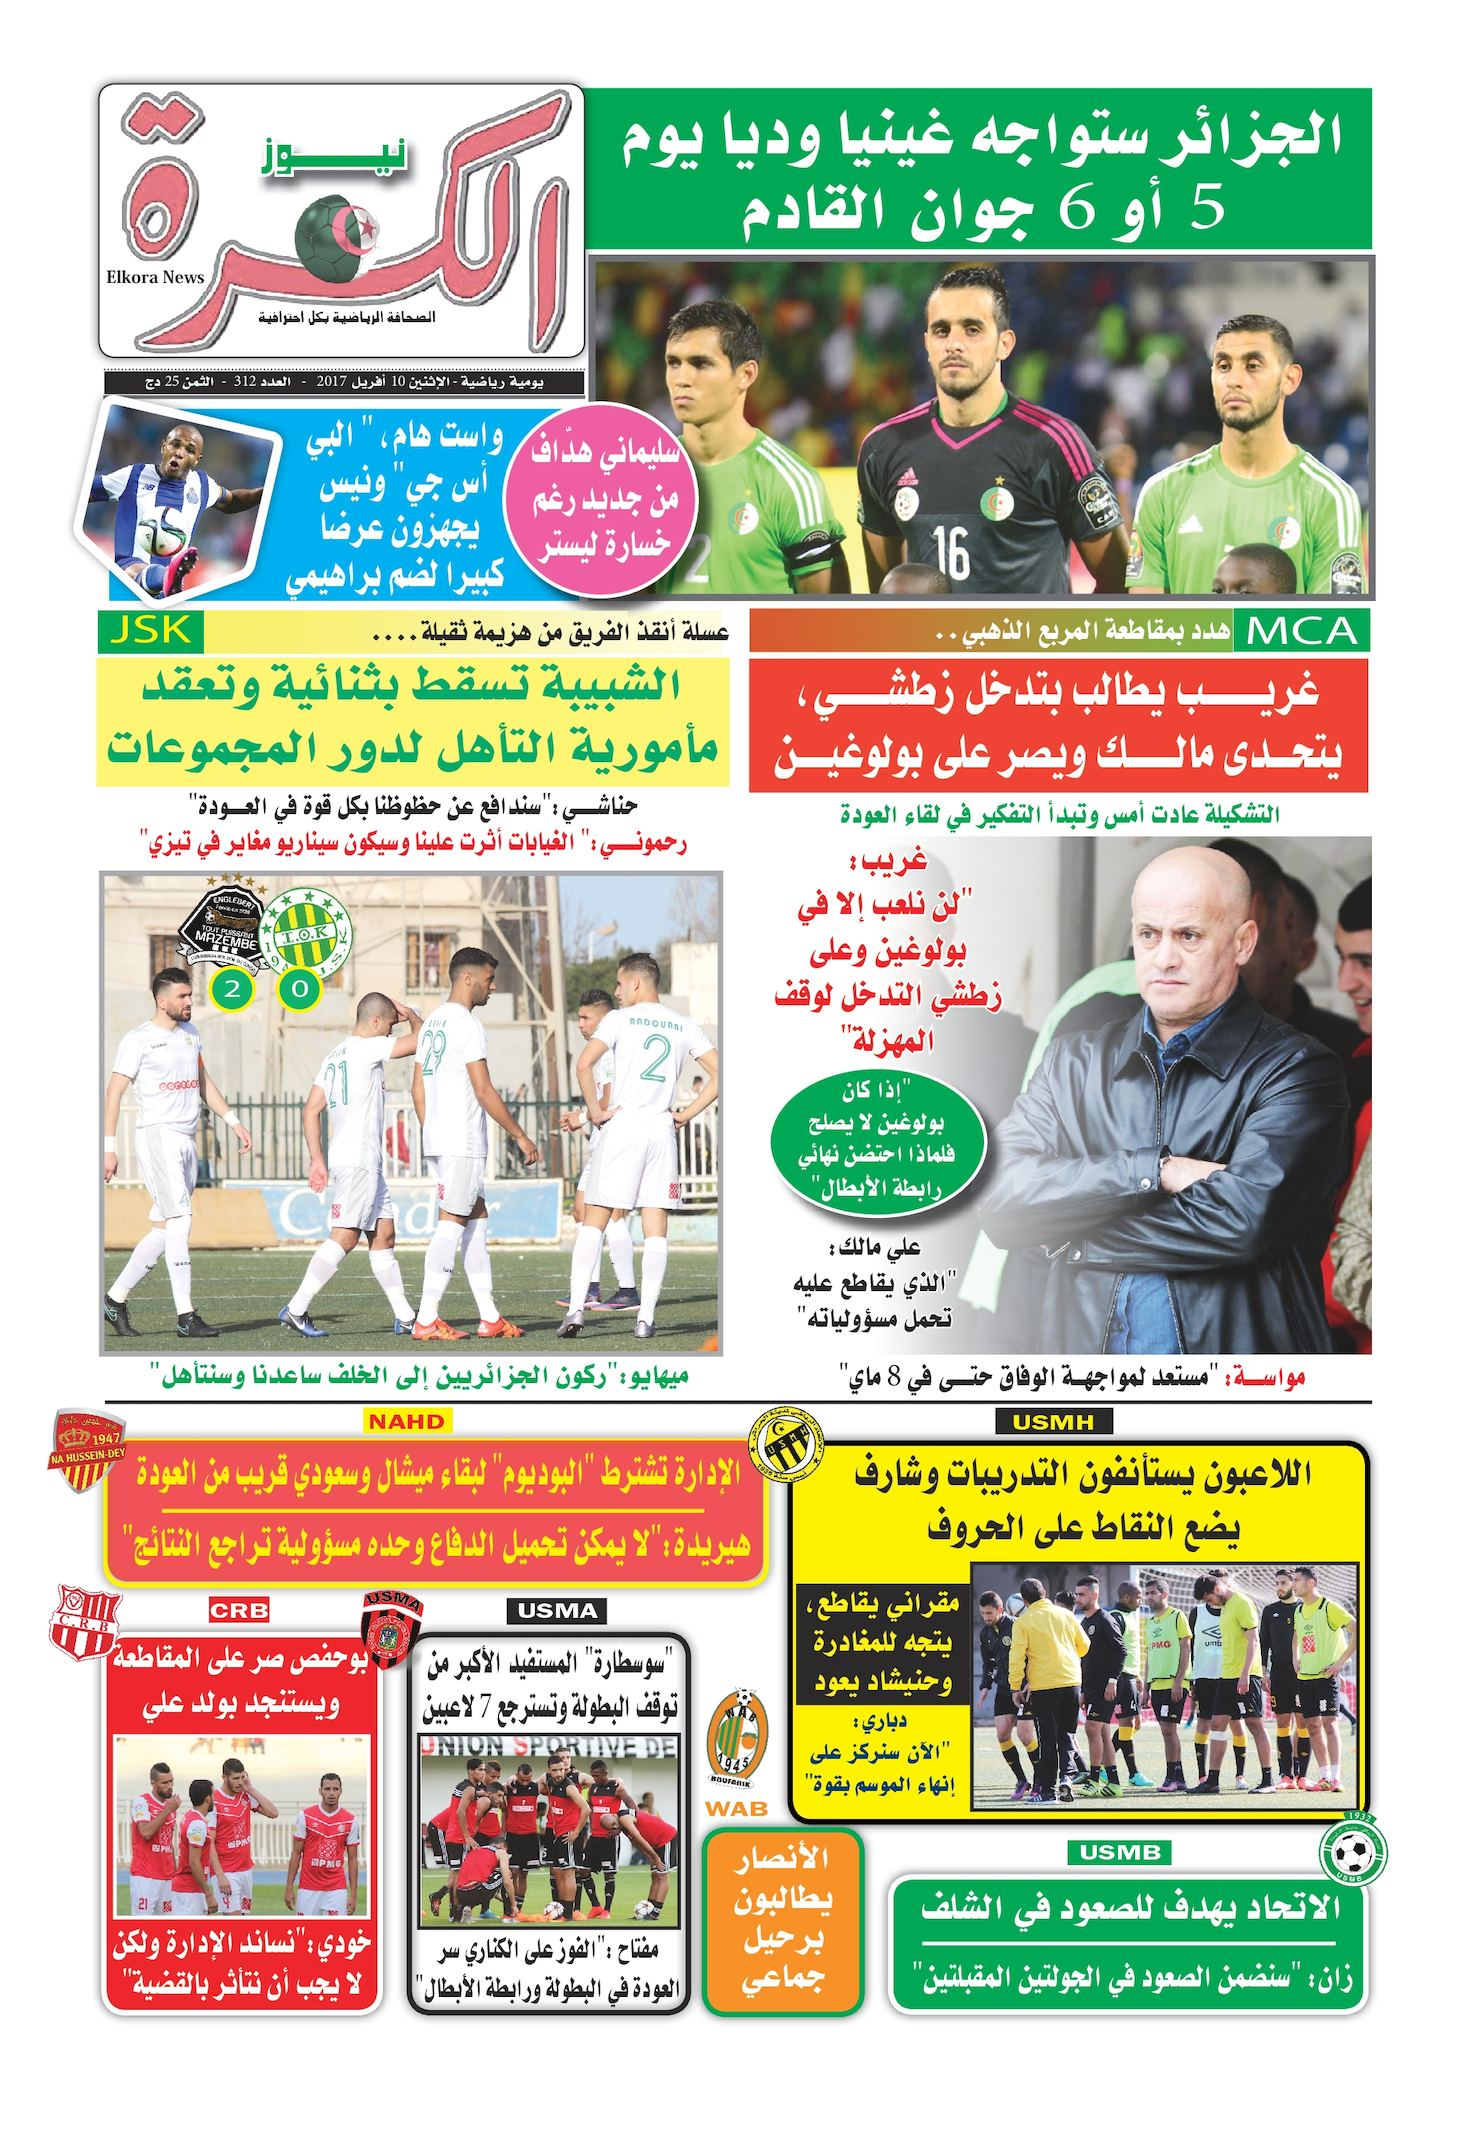 el kora news lee 10-04-2017